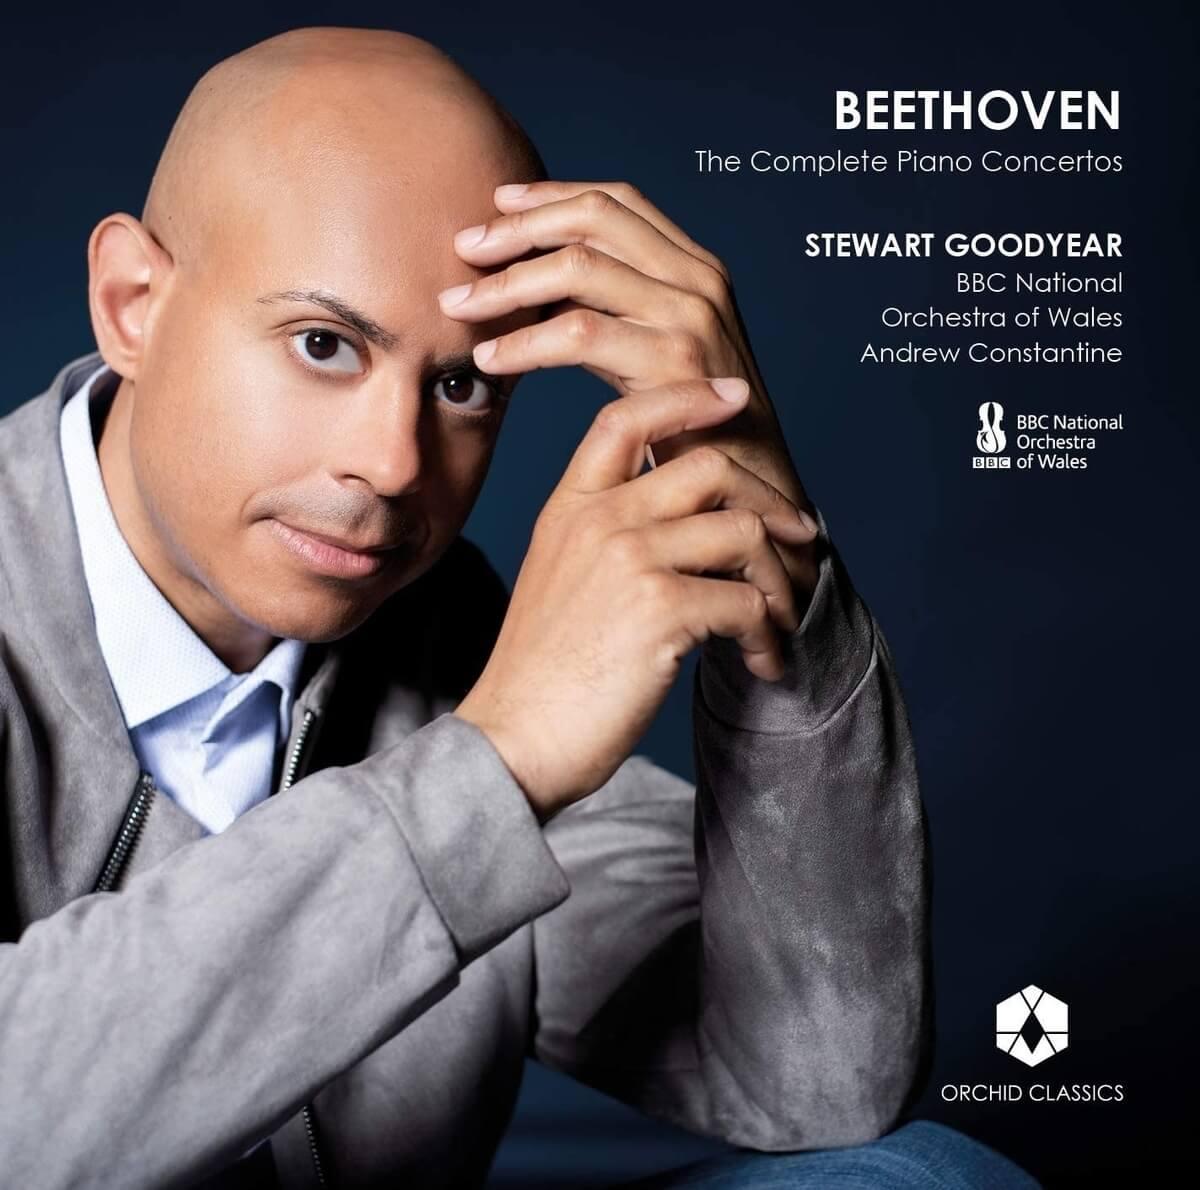 Stewart Goodyear Beethoven Concertos